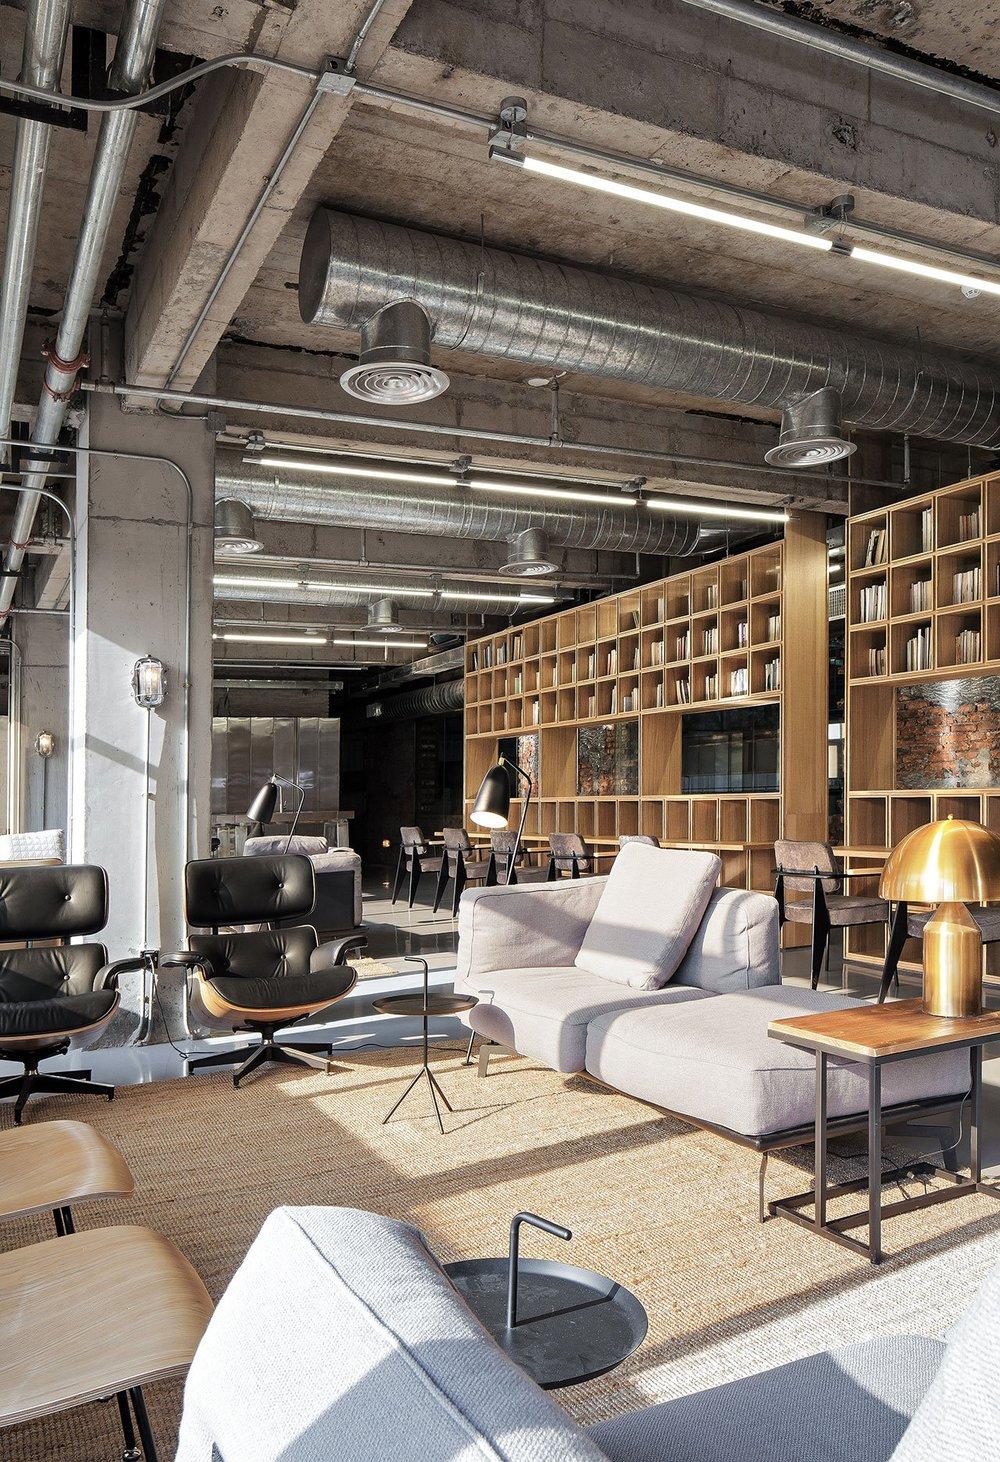 FlaHalo-Office-Manufactory-7.jpeg